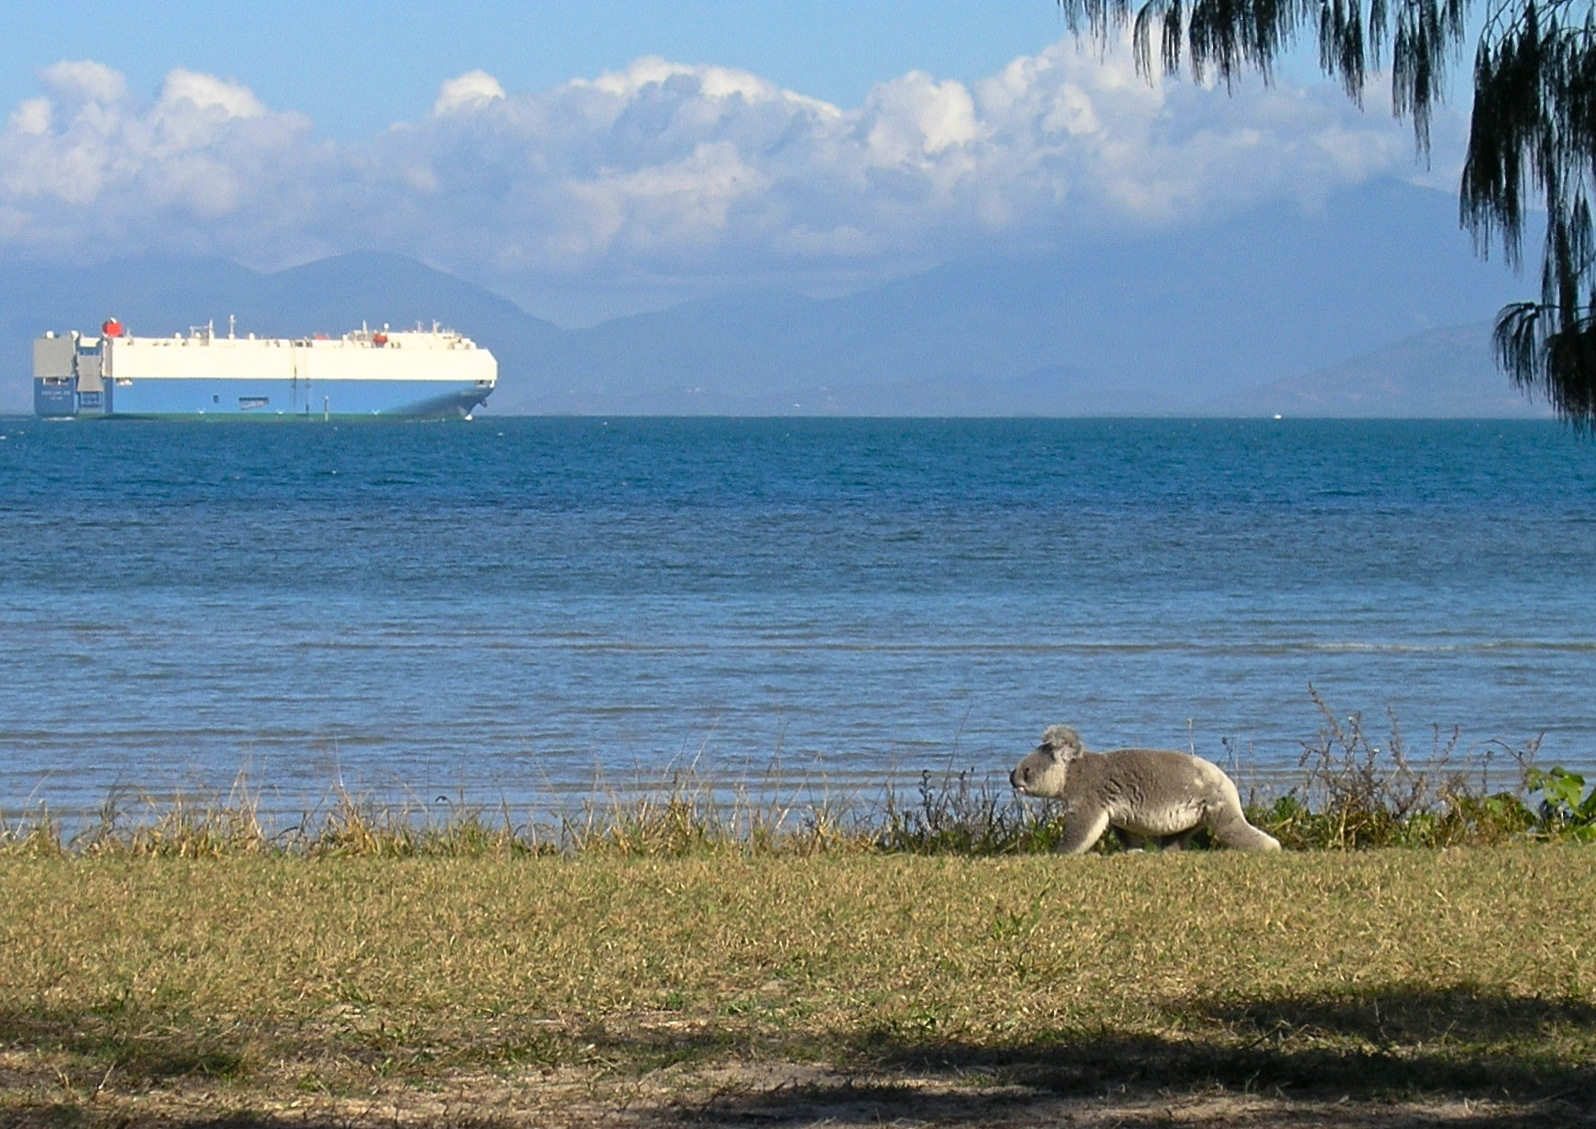 koala walks past car ship.jpg